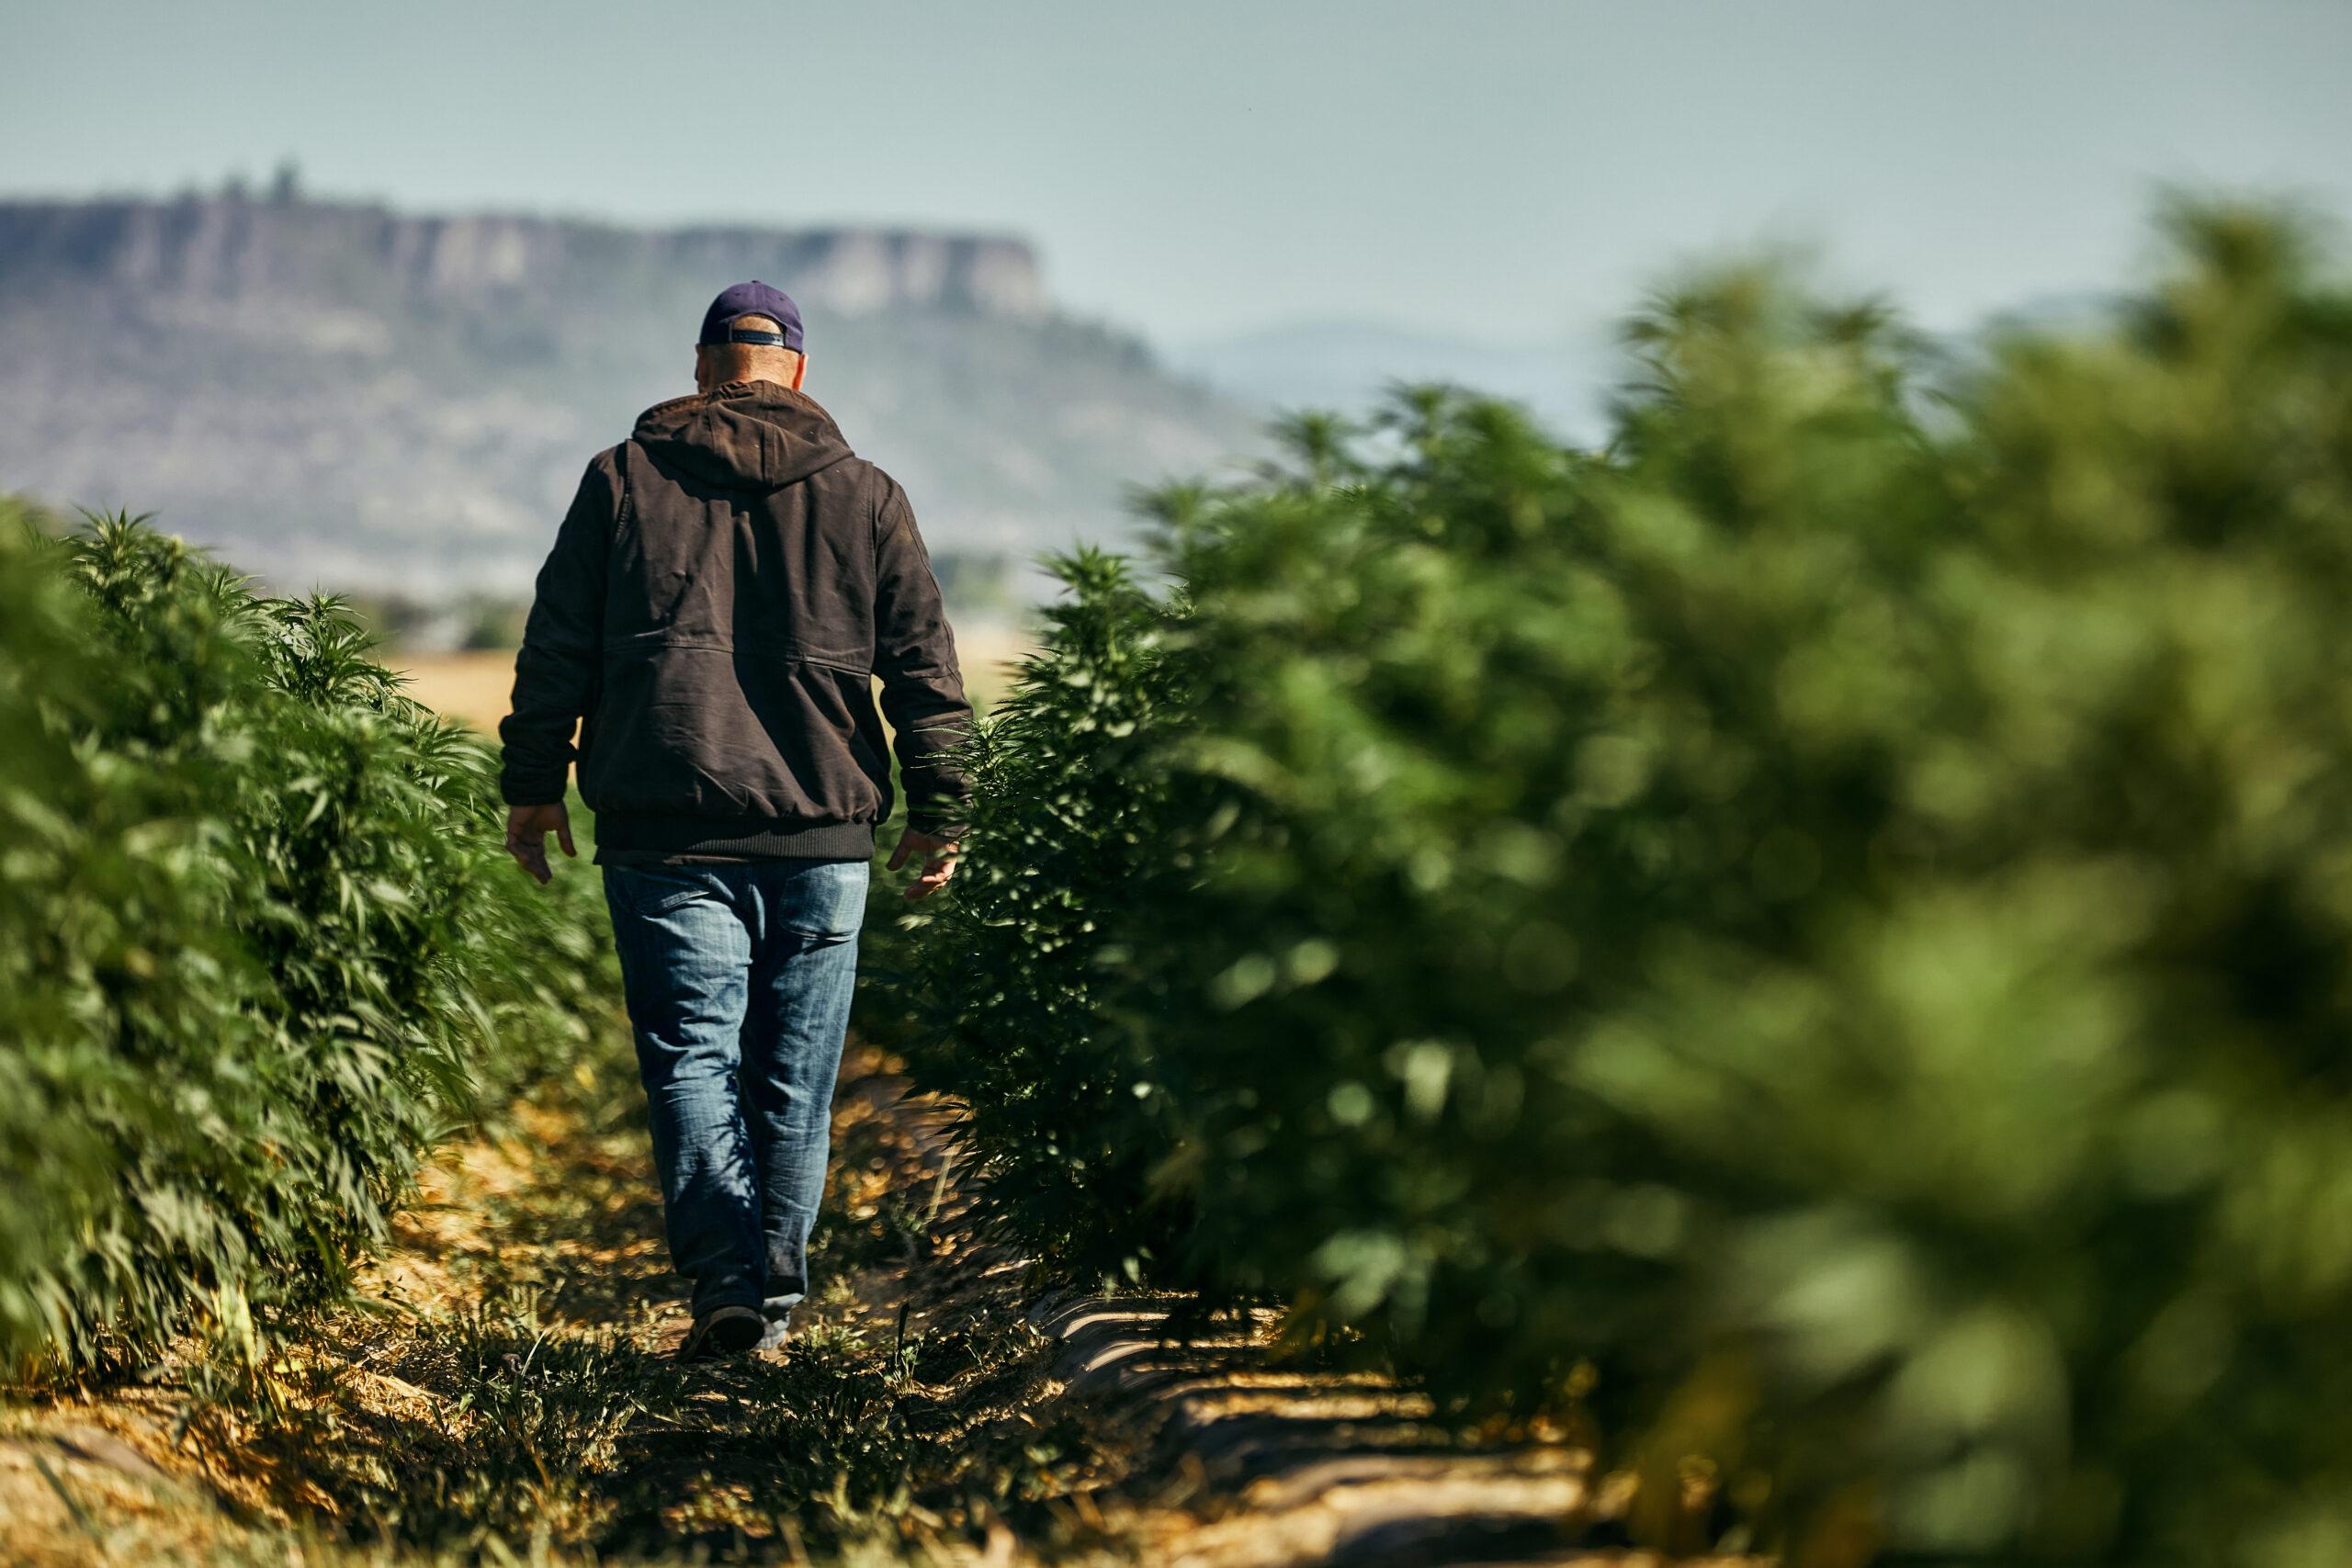 Terpene Fresh - Scottsdale Brand Lifestyle Photography - Cannabis Cultivator Walking Through Fields